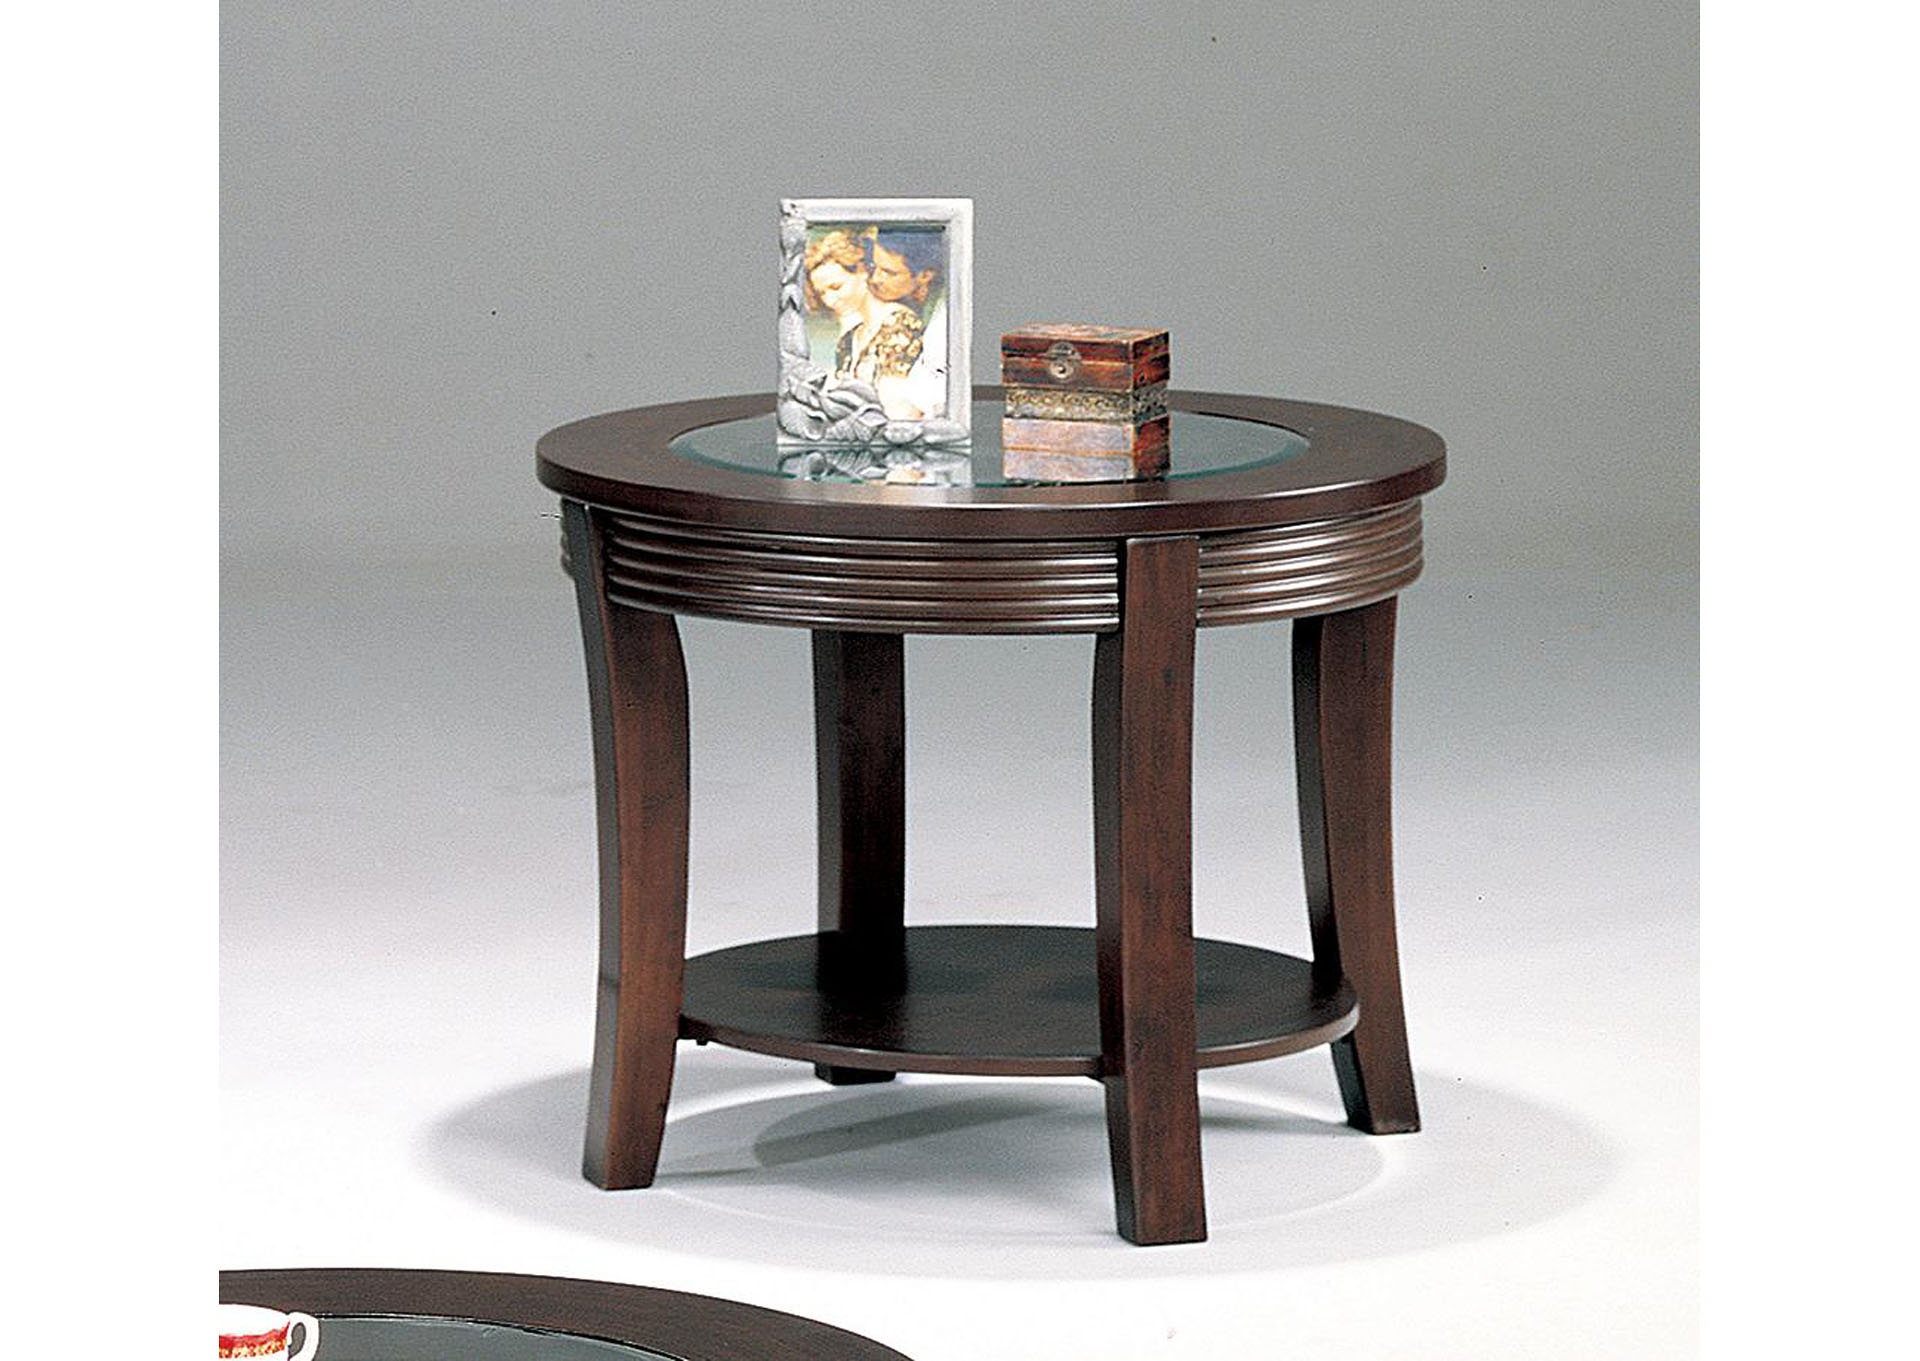 Big Box Furniture Discount Furniture Stores In Miami Florida End Table